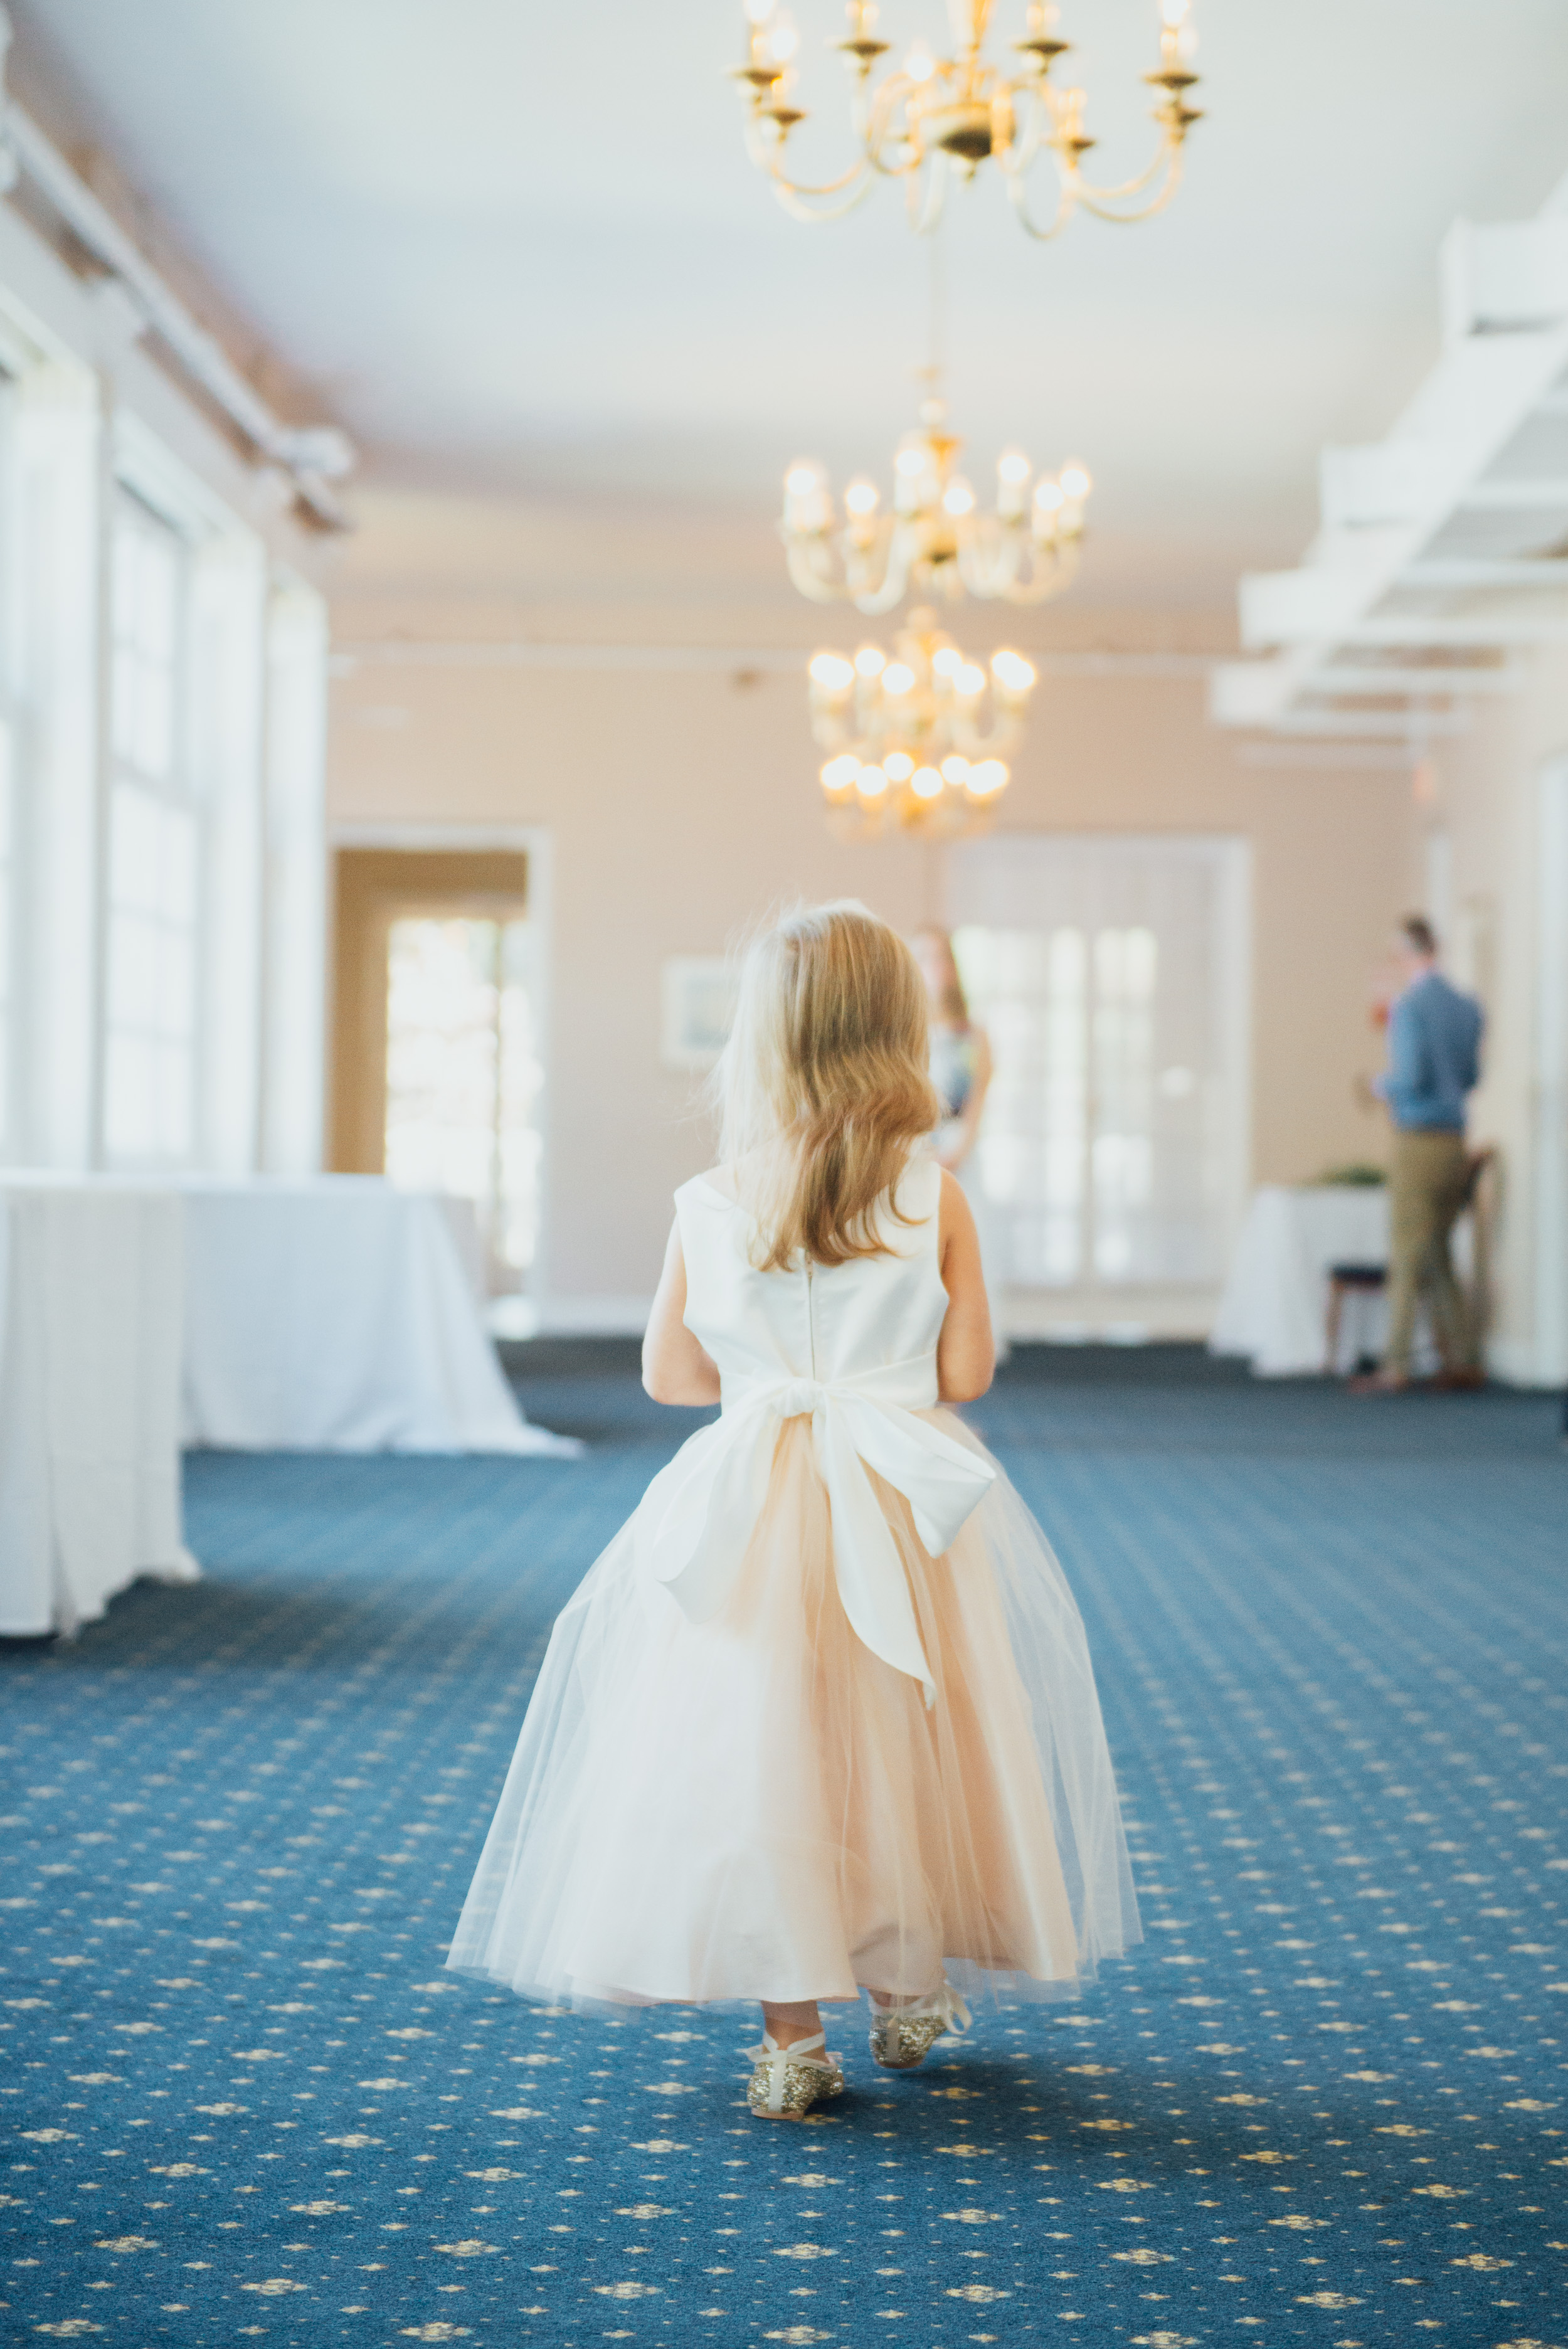 cleland-studios-wedding-photography-23.jpg